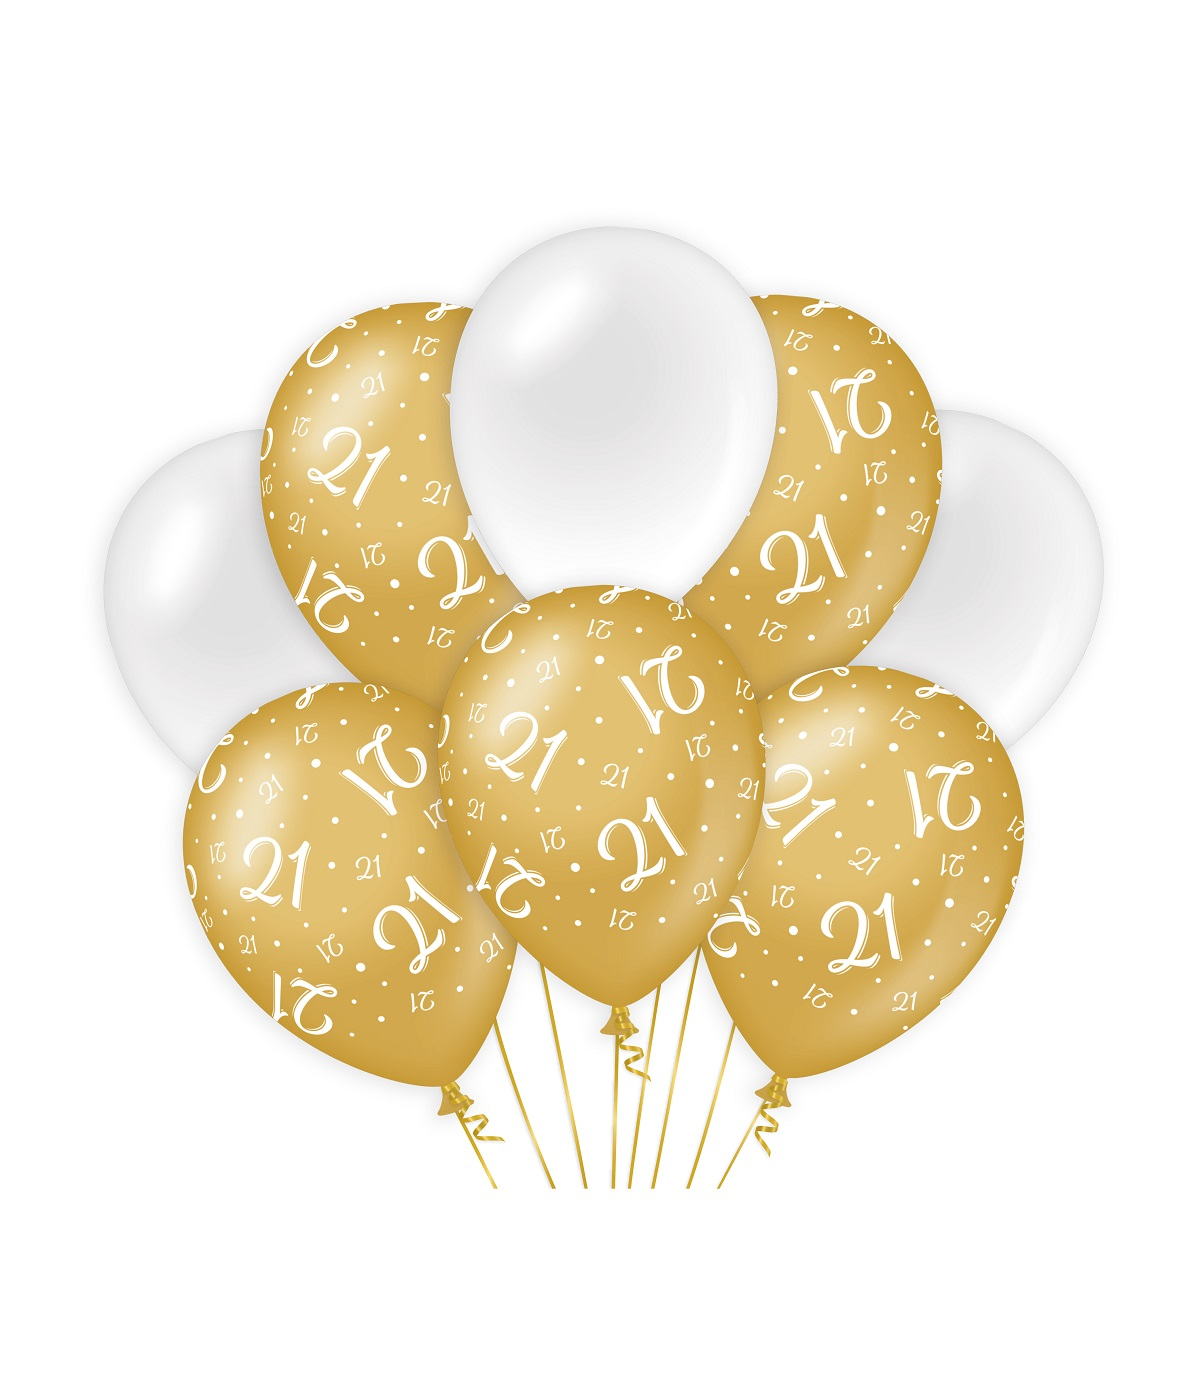 "8st Ballonnen 21 Jaar Goud/Wit 12"""